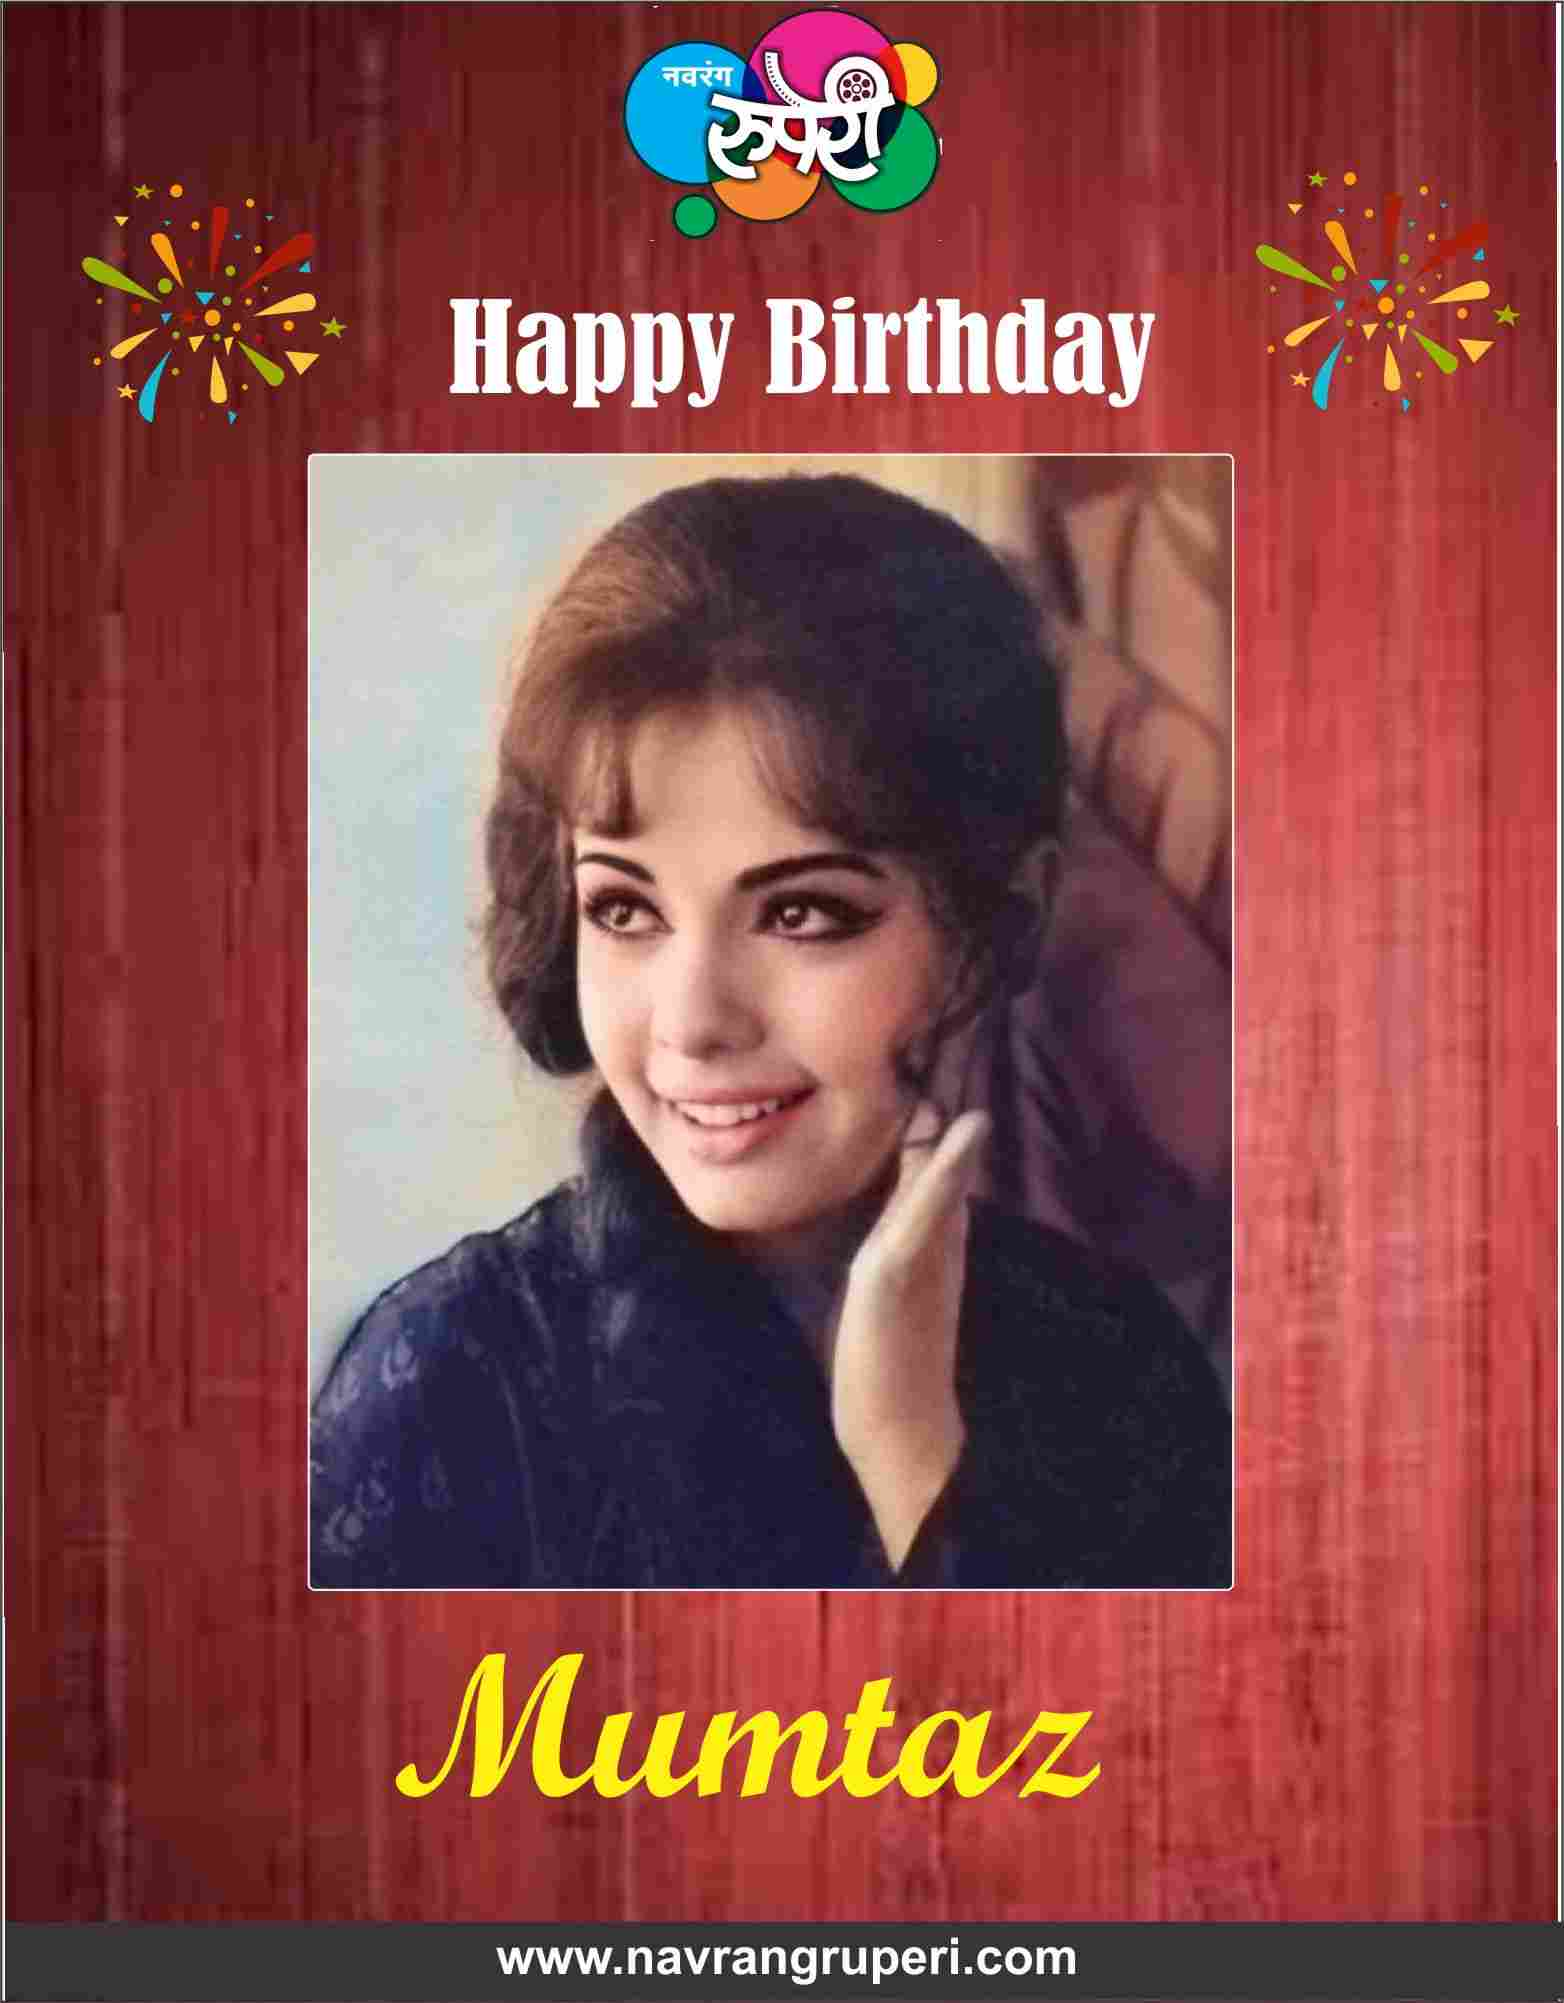 Hindi Cinema's Glamorous Actress from Golden Era, Actress Mumtaz